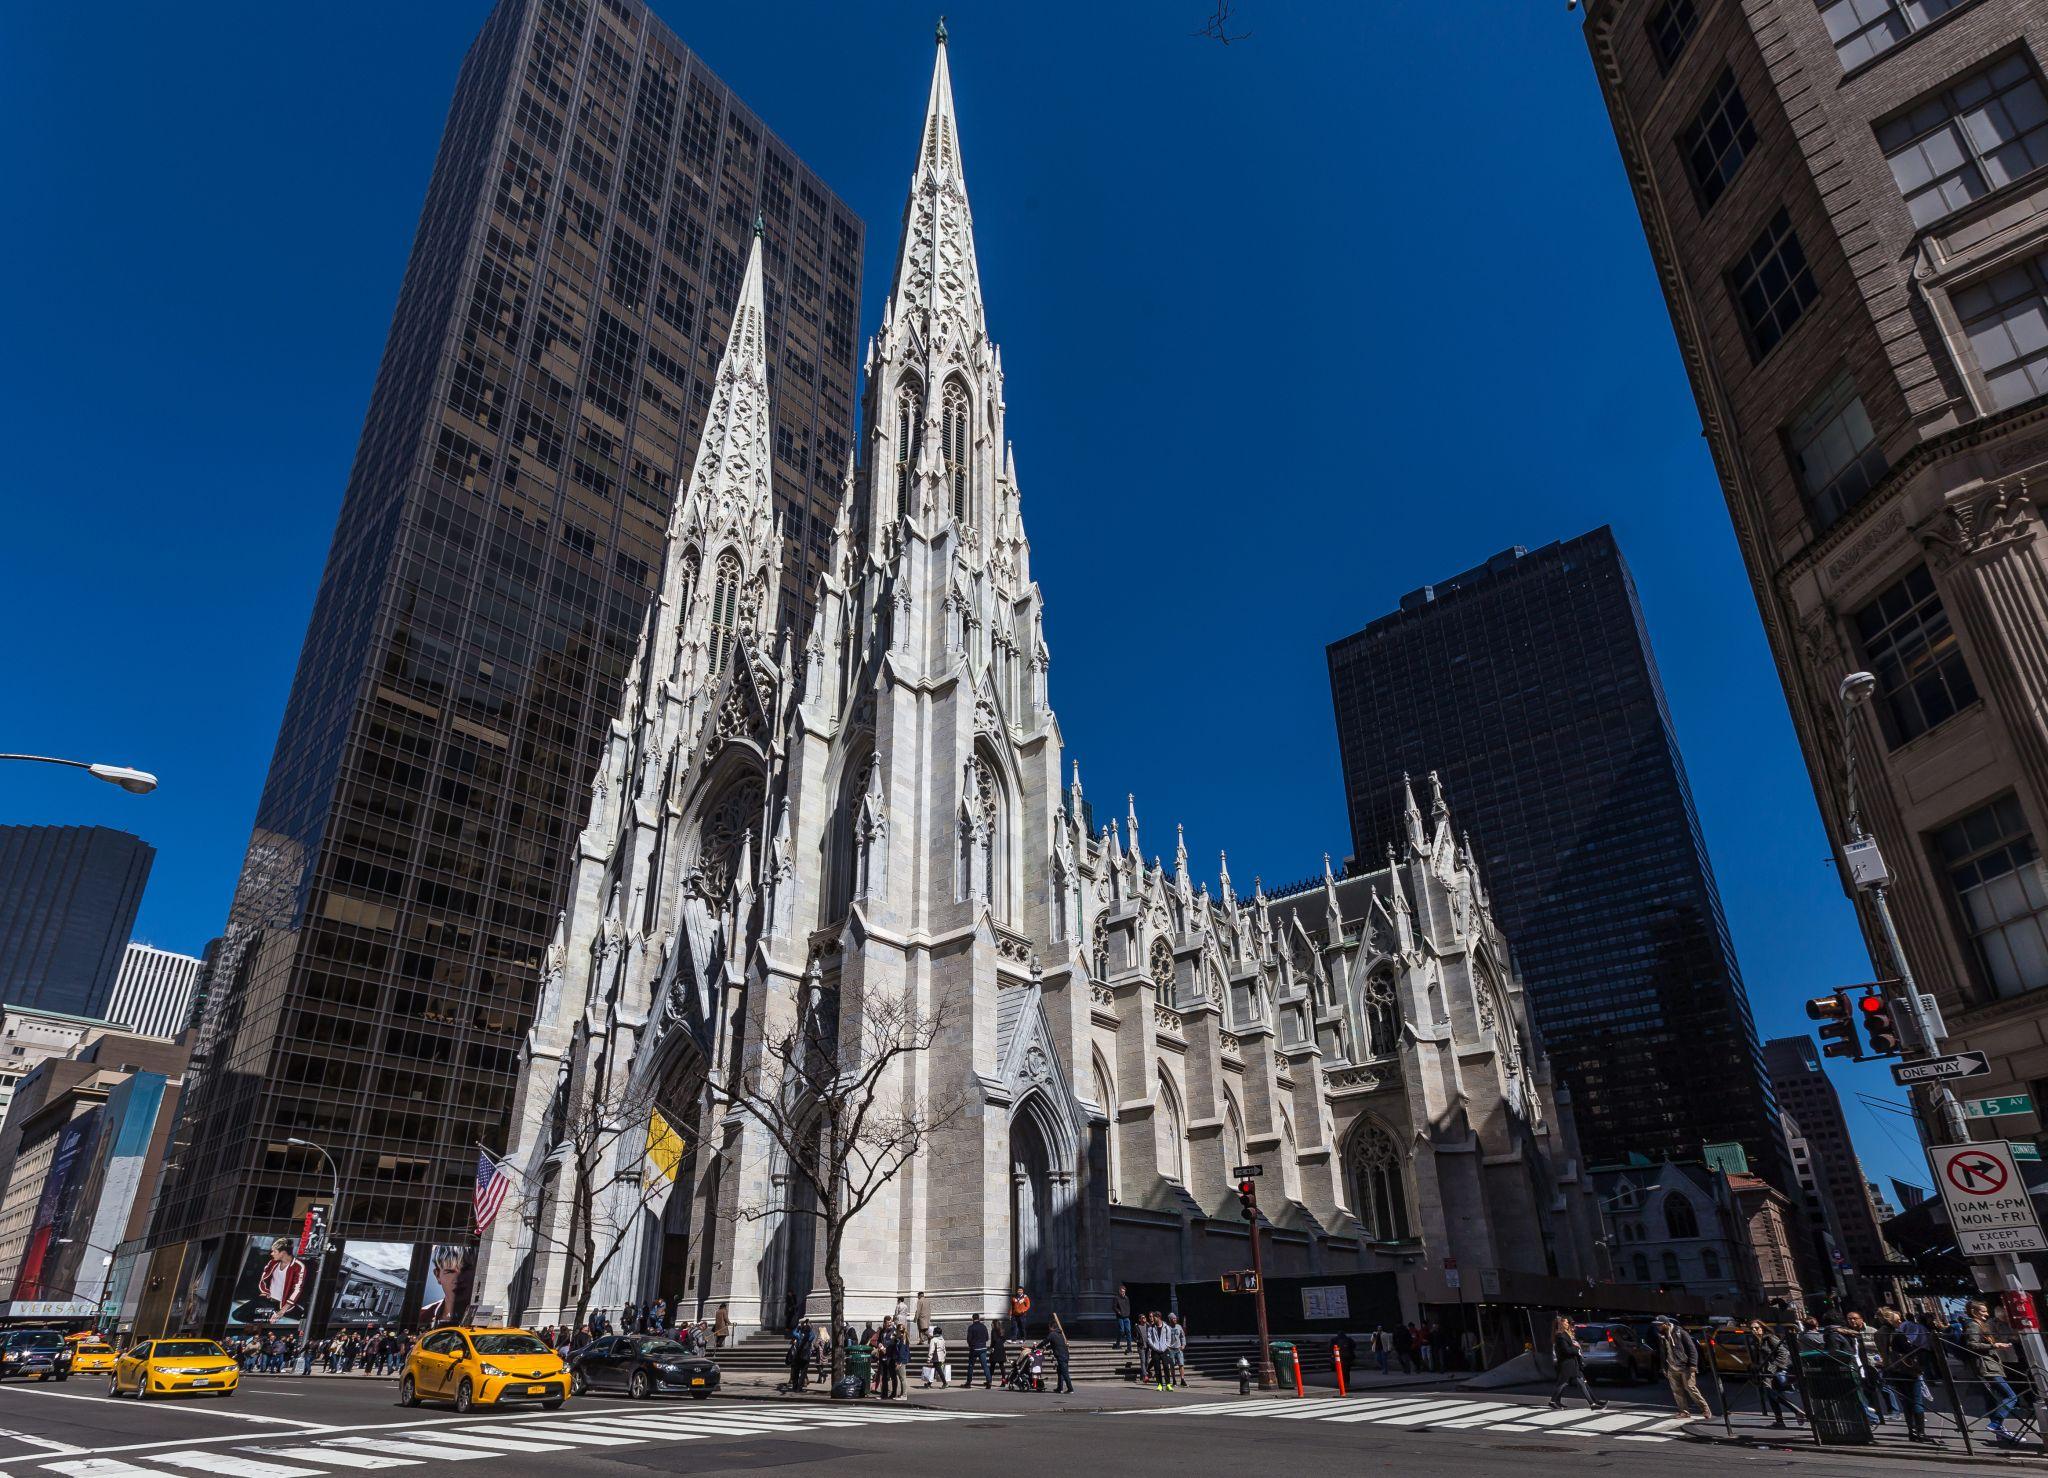 Saint Patrick's Cathedral, USA